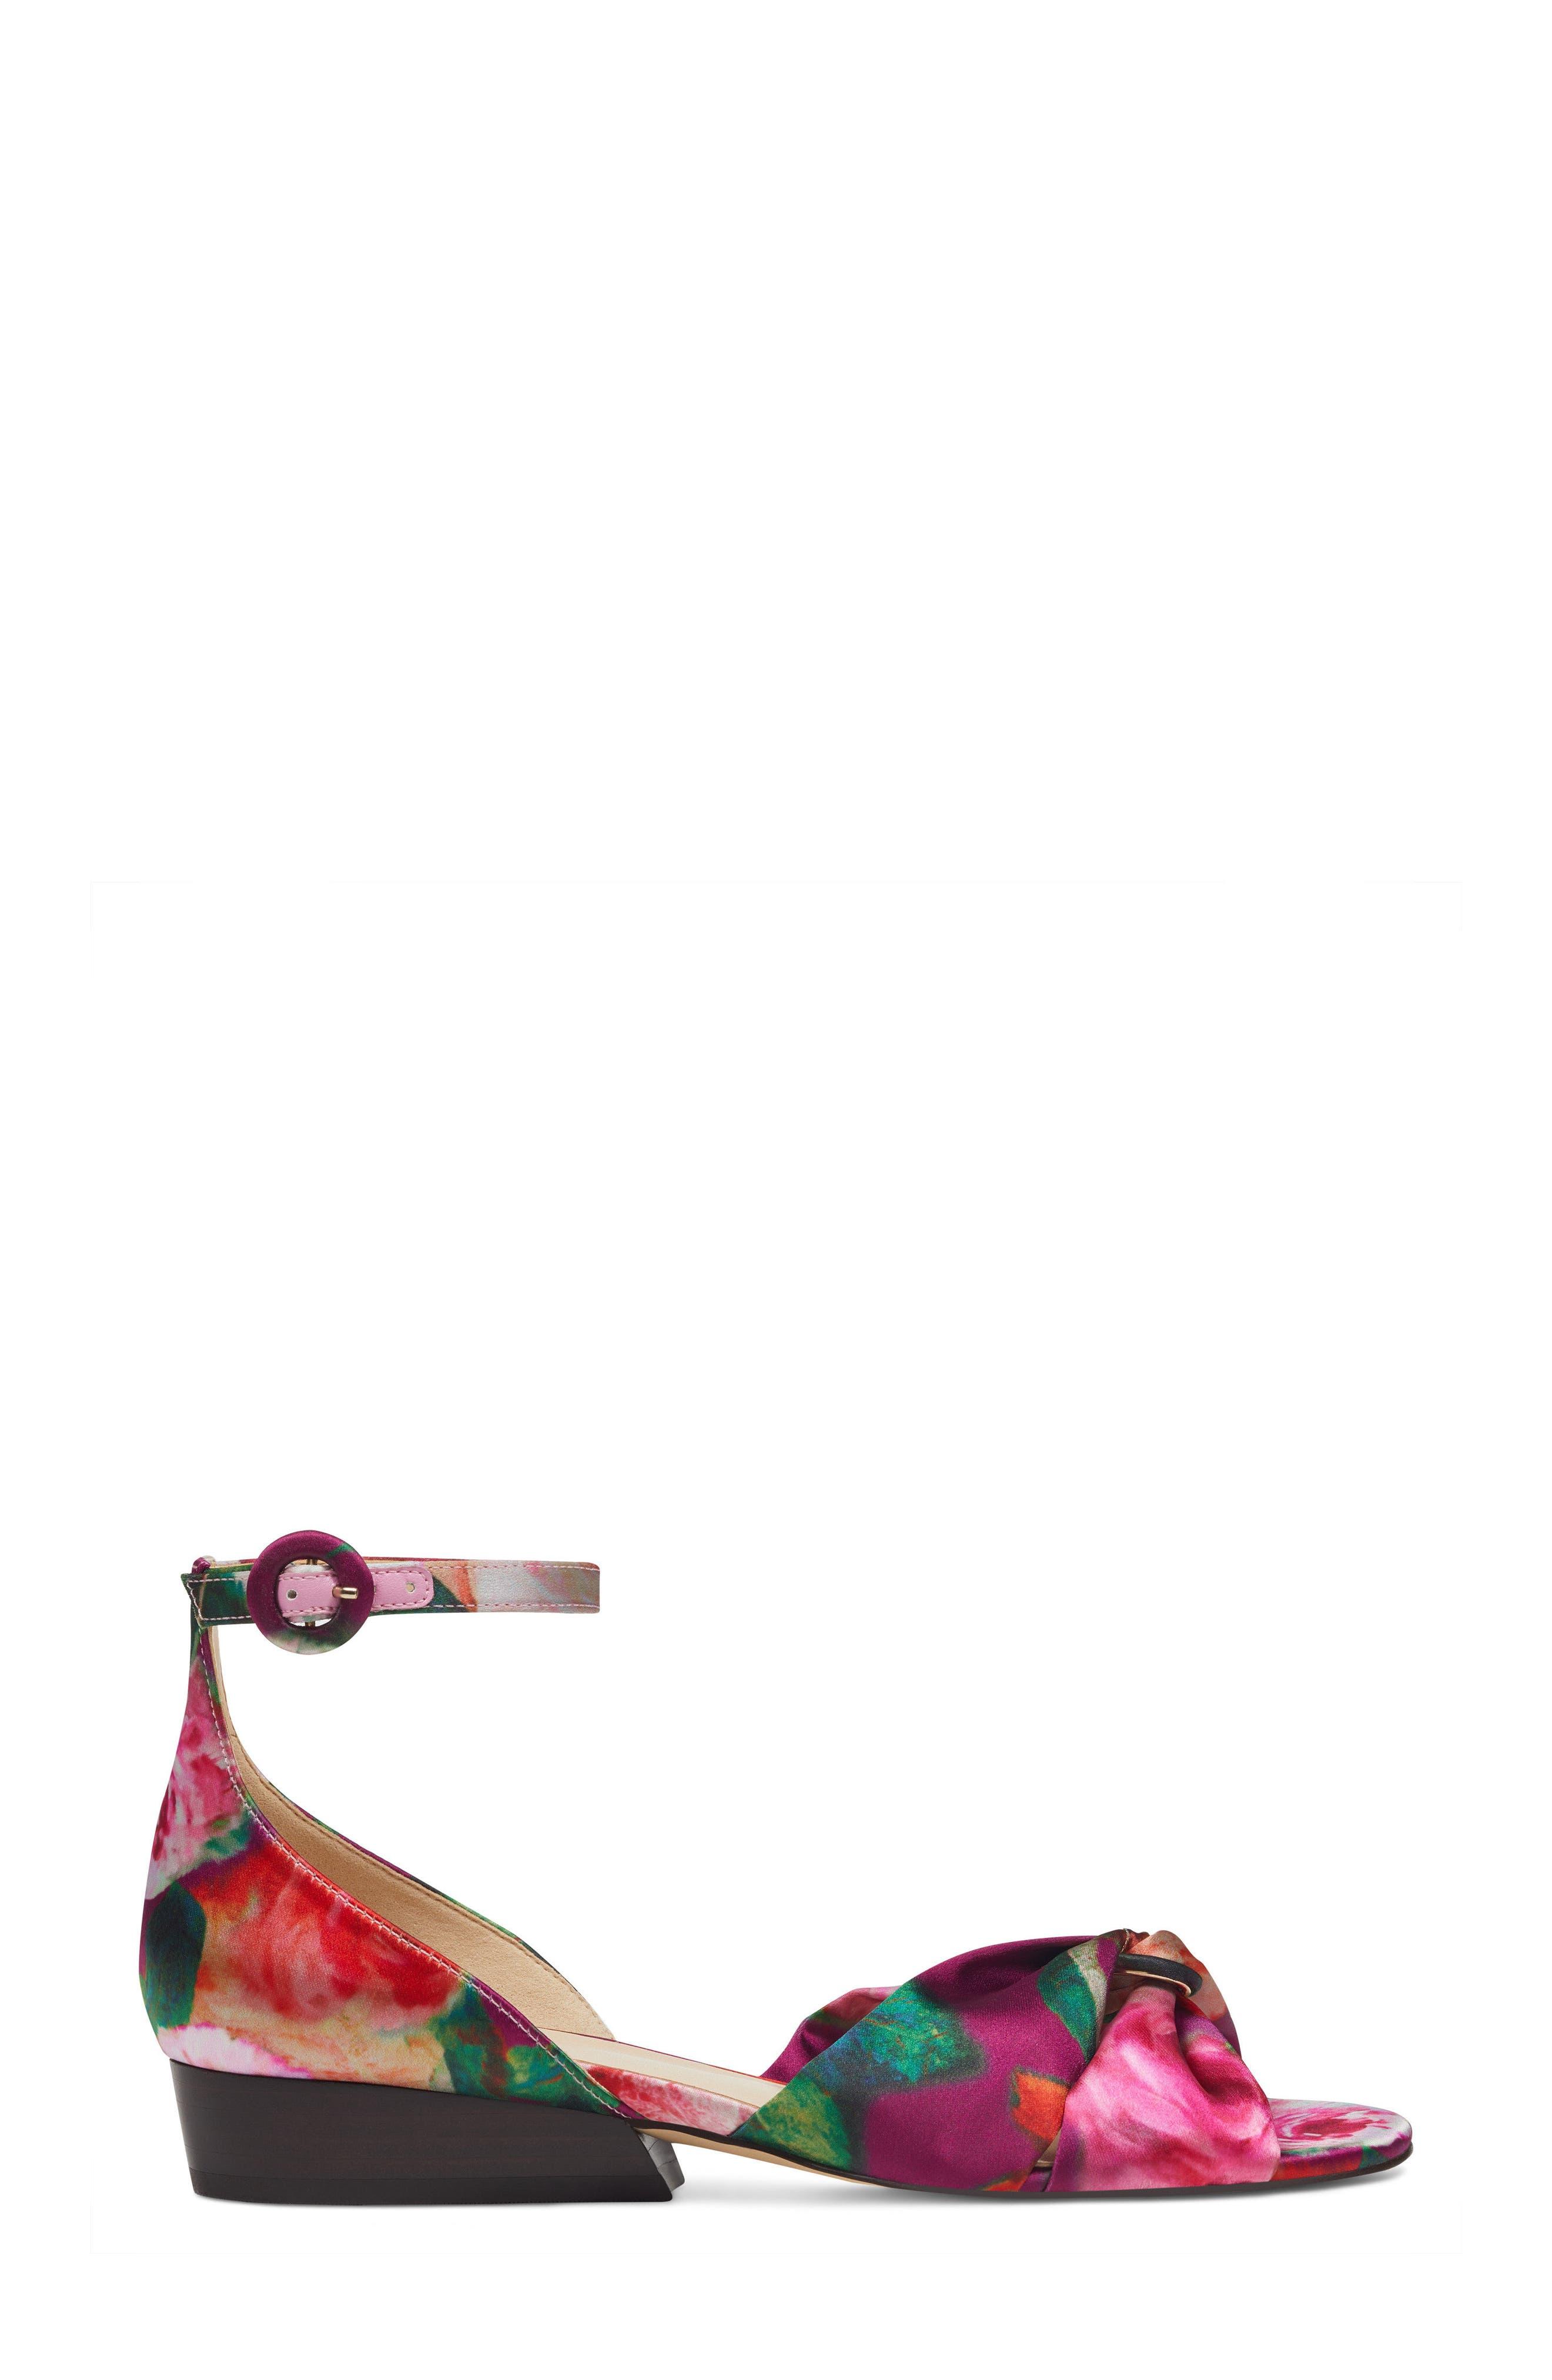 Lumsi Ankle Strap Sandal,                             Alternate thumbnail 3, color,                             Pink Multi Satin